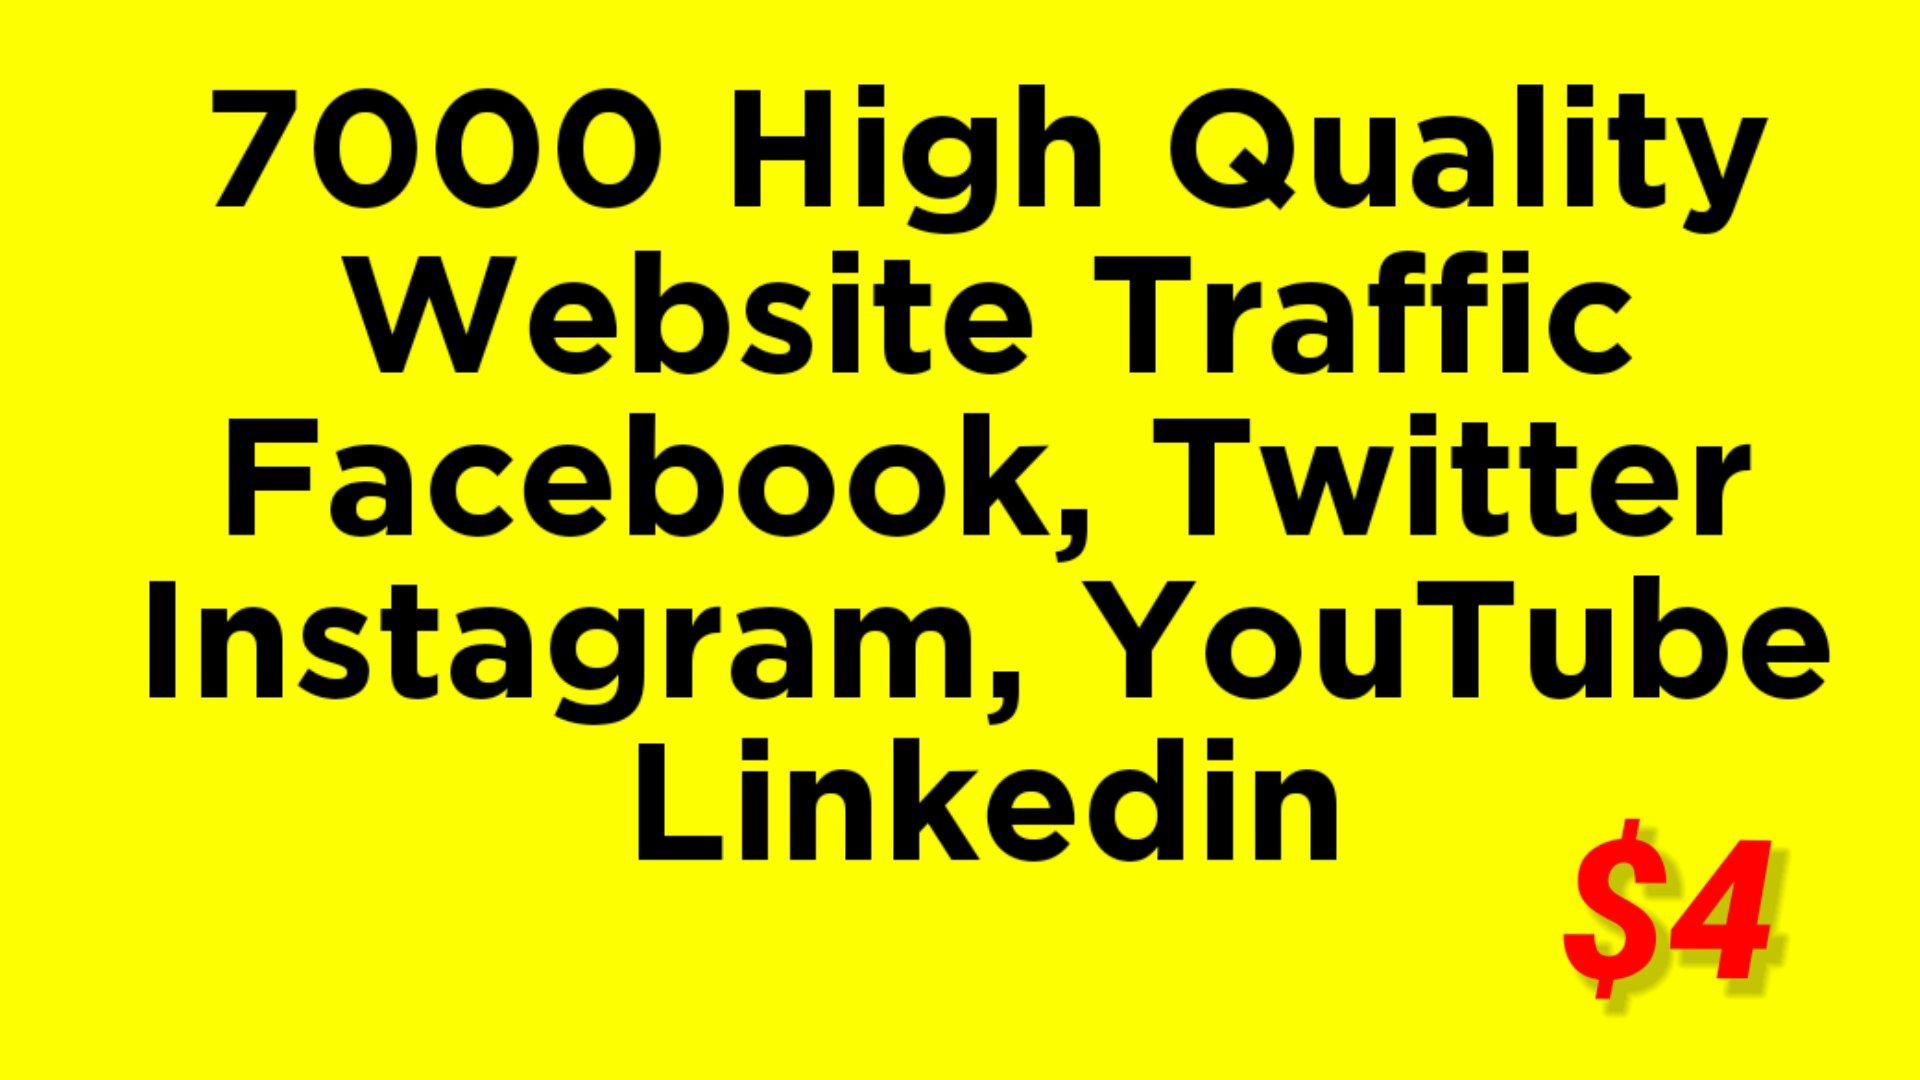 Real HQ 7000 + human worldwide website traffic